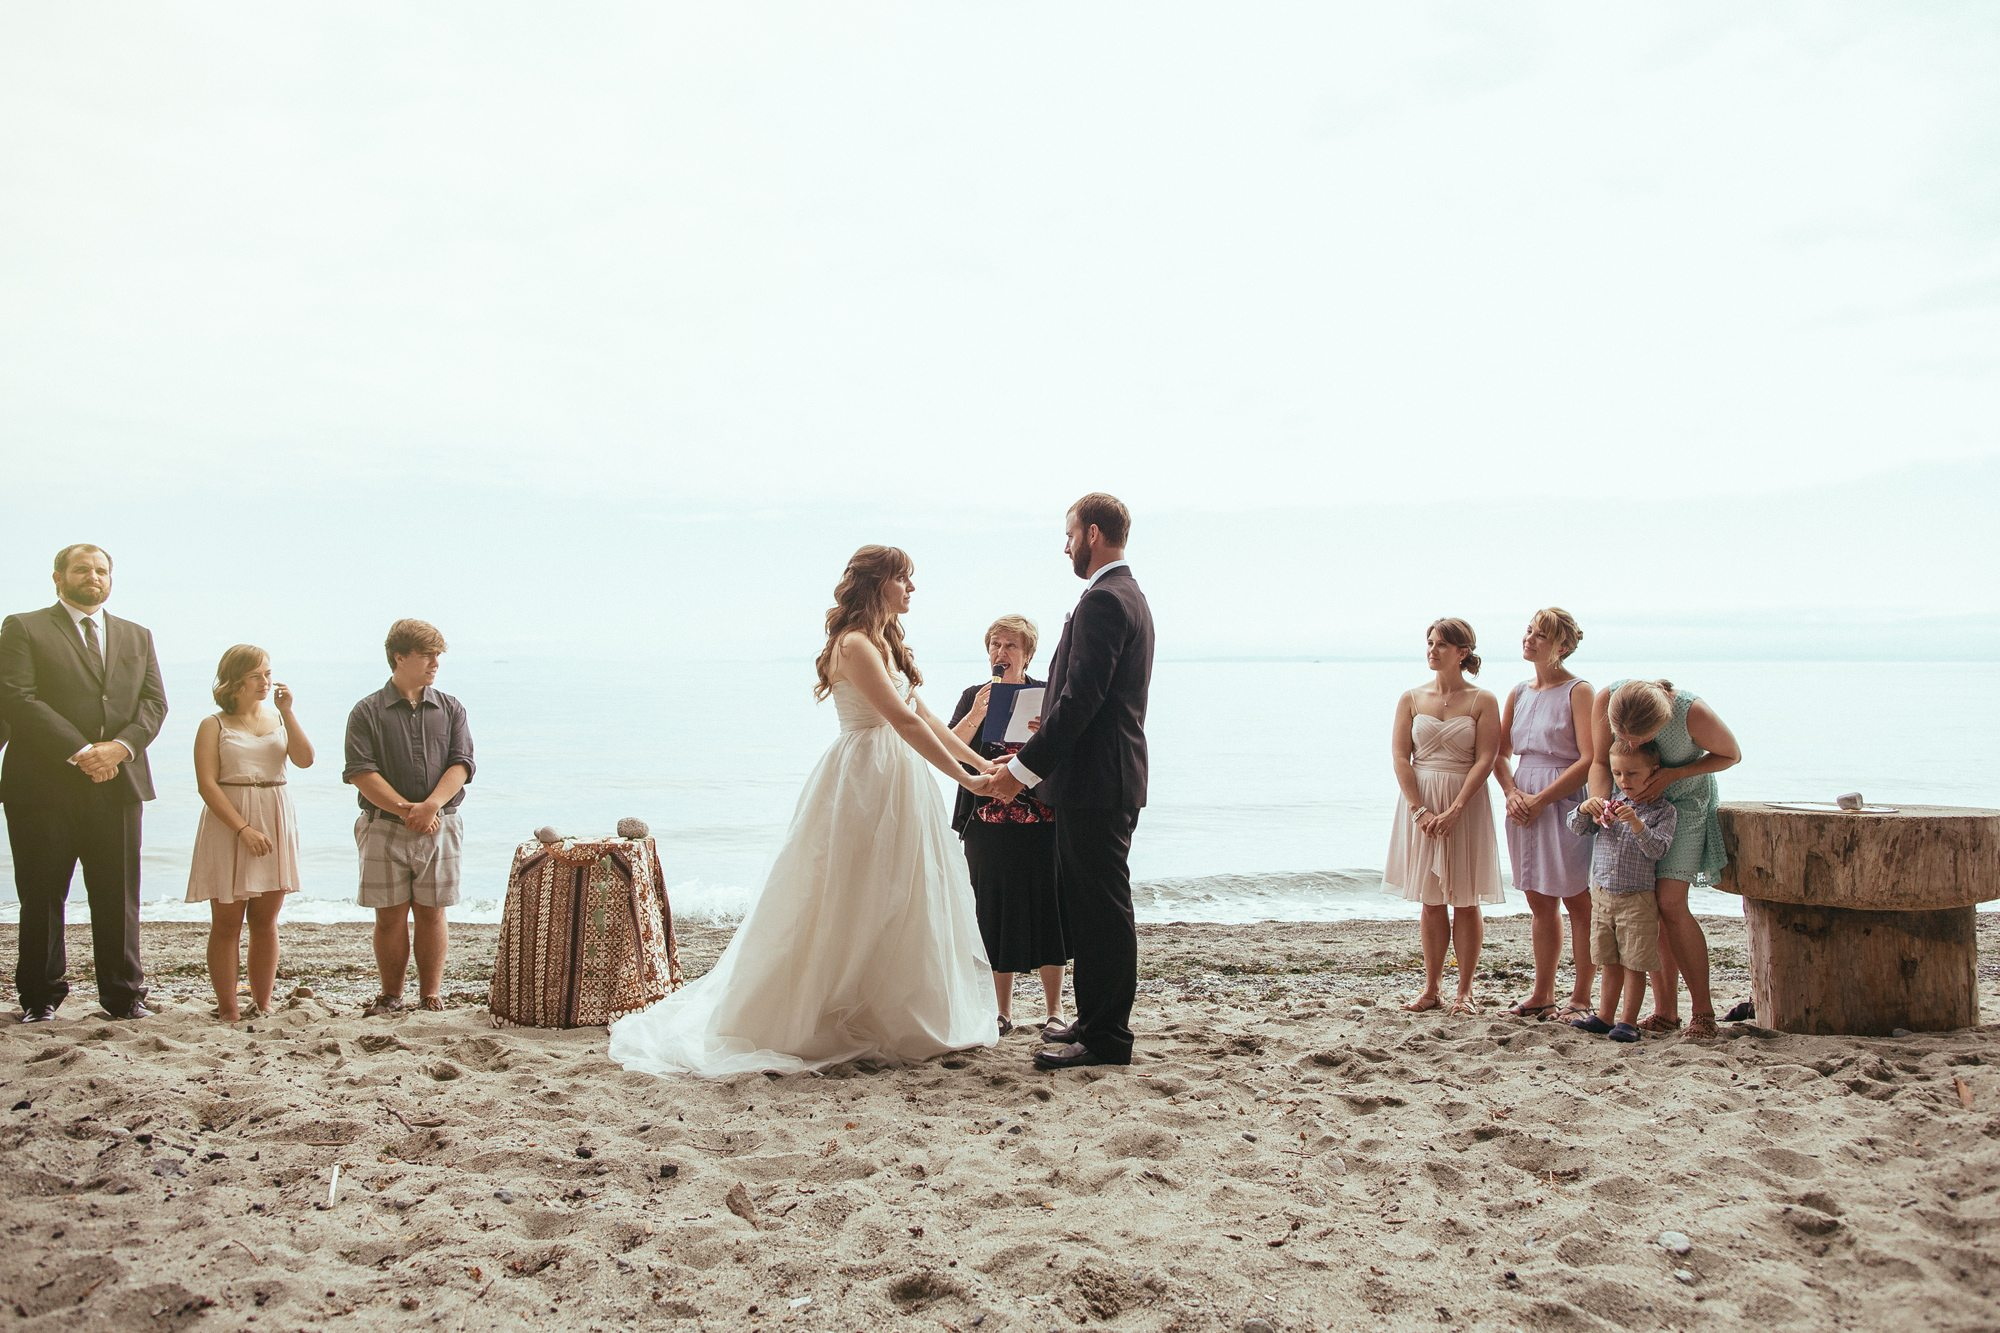 gibsons-wedding-photography-robert-devon26